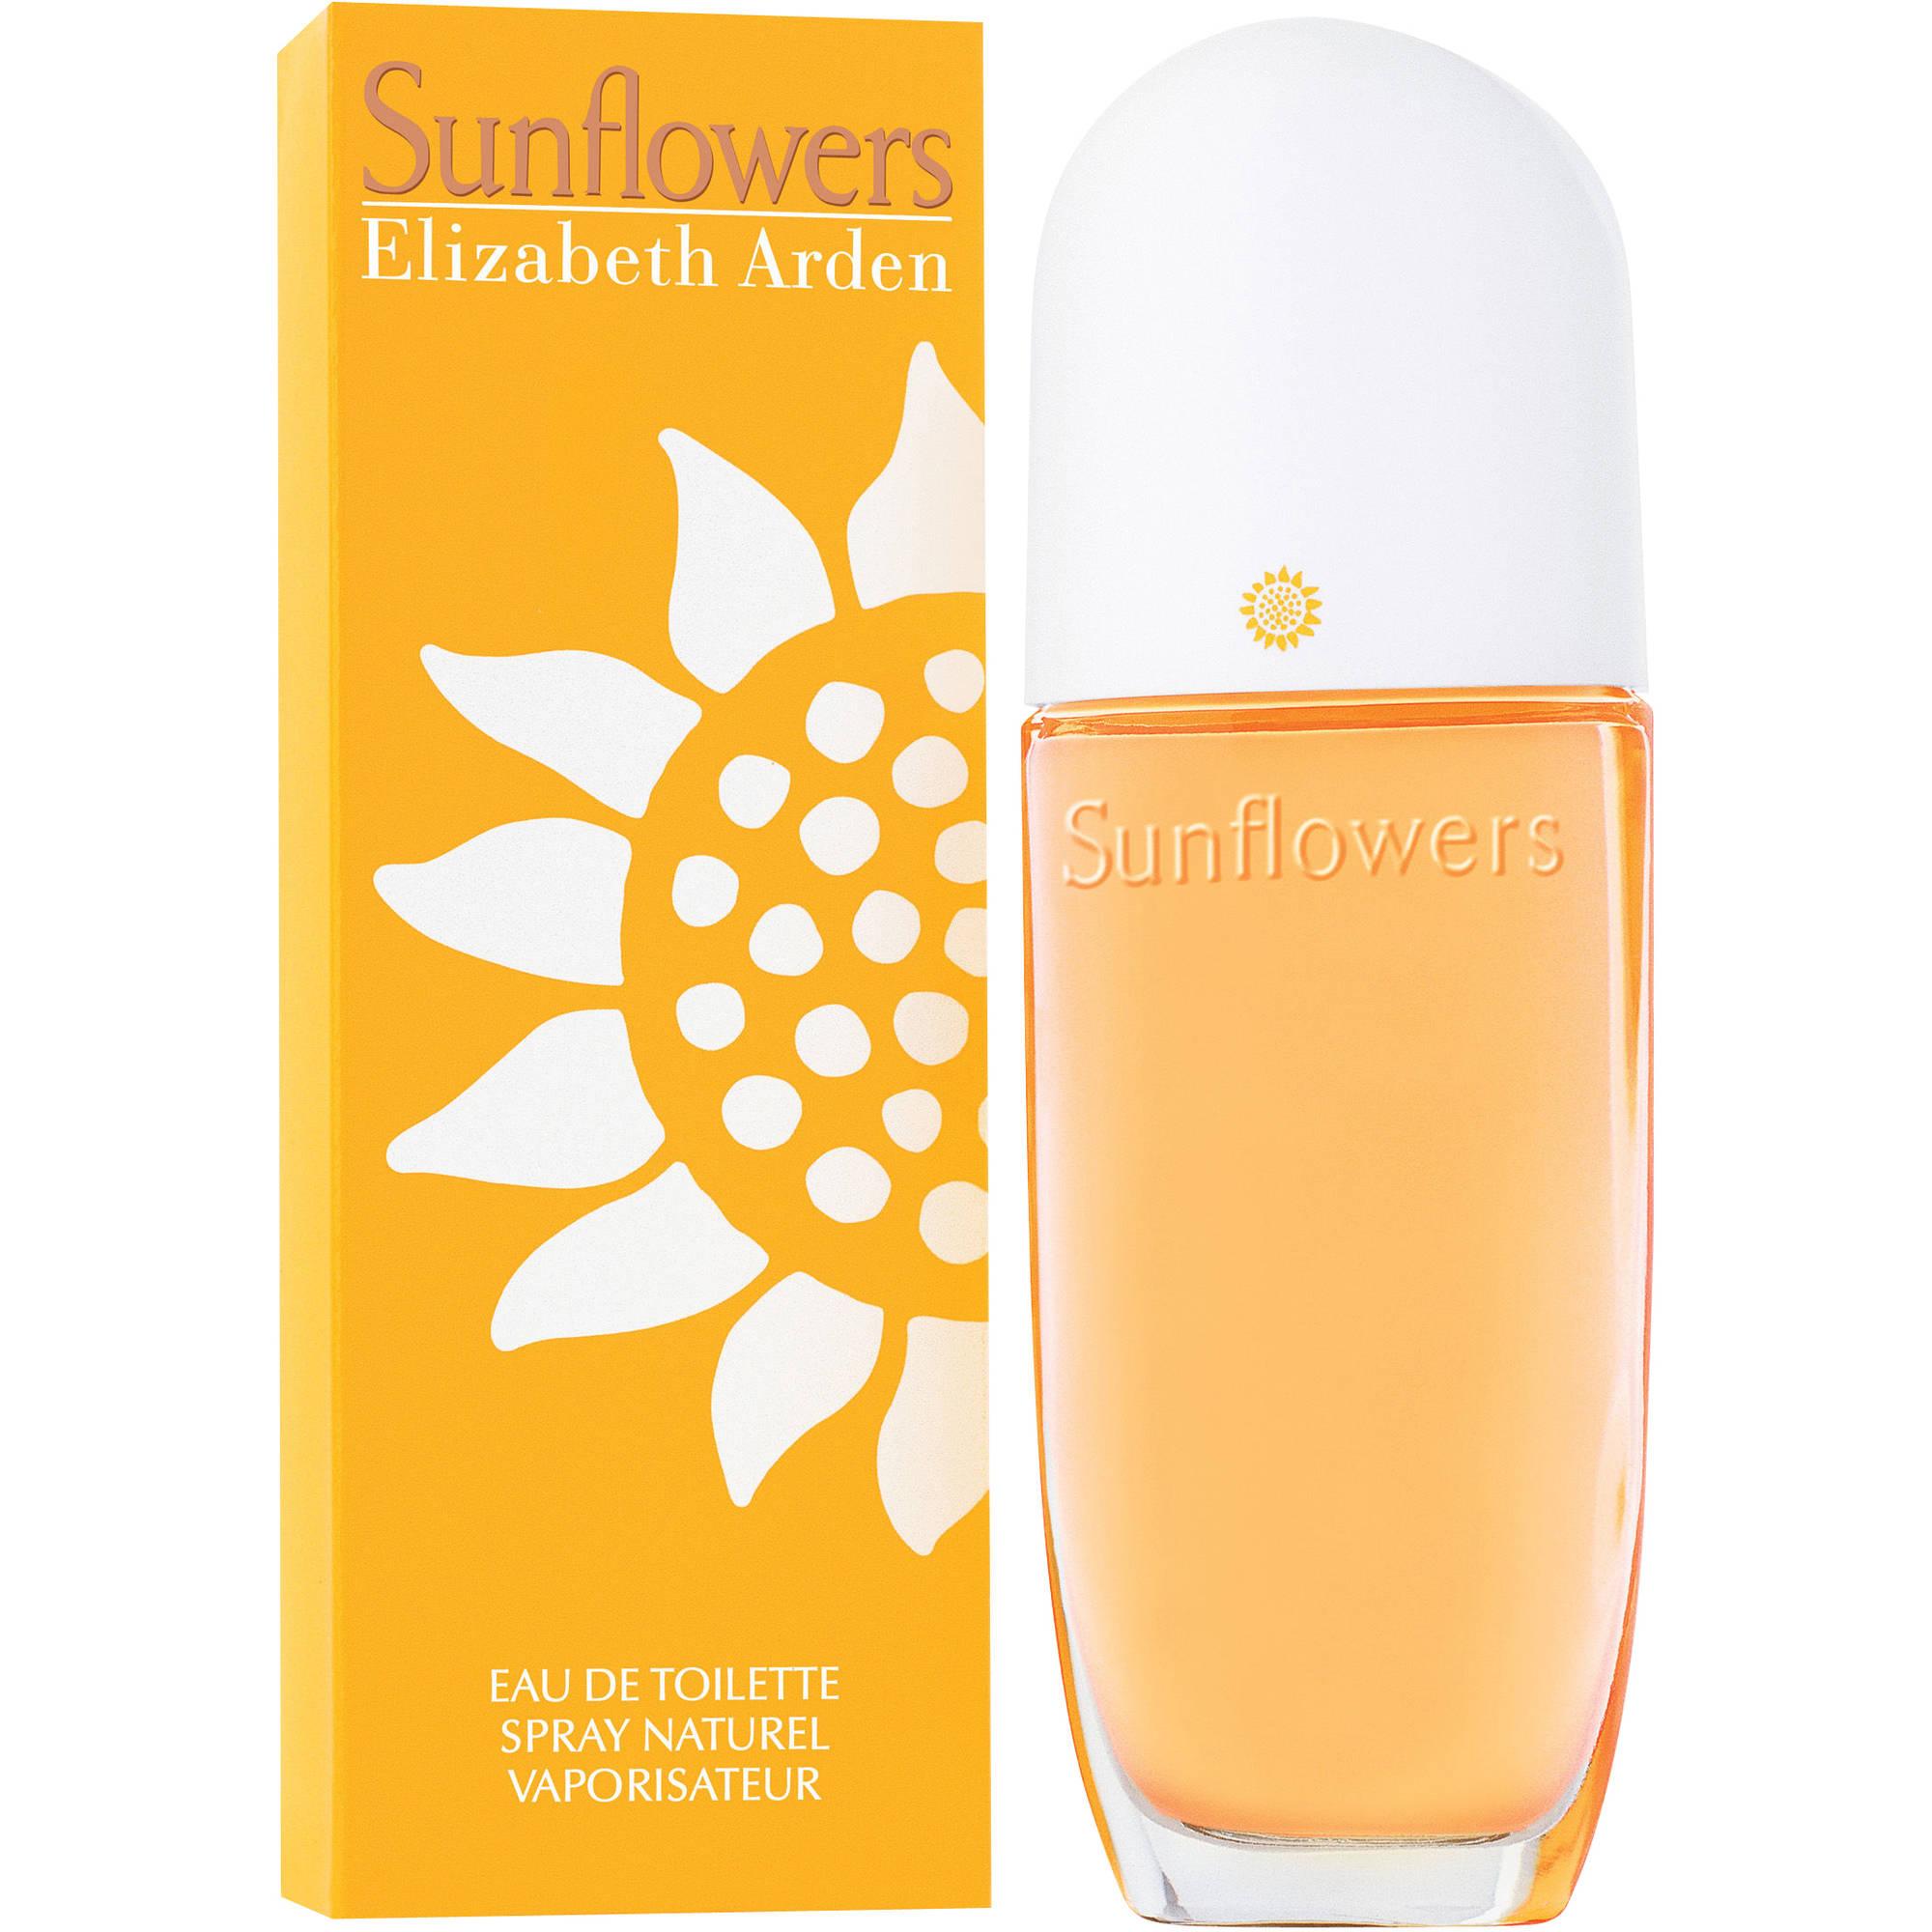 Elizabeth Arden Sunflowers Eau de Toilette Spray, 3.3 fl oz